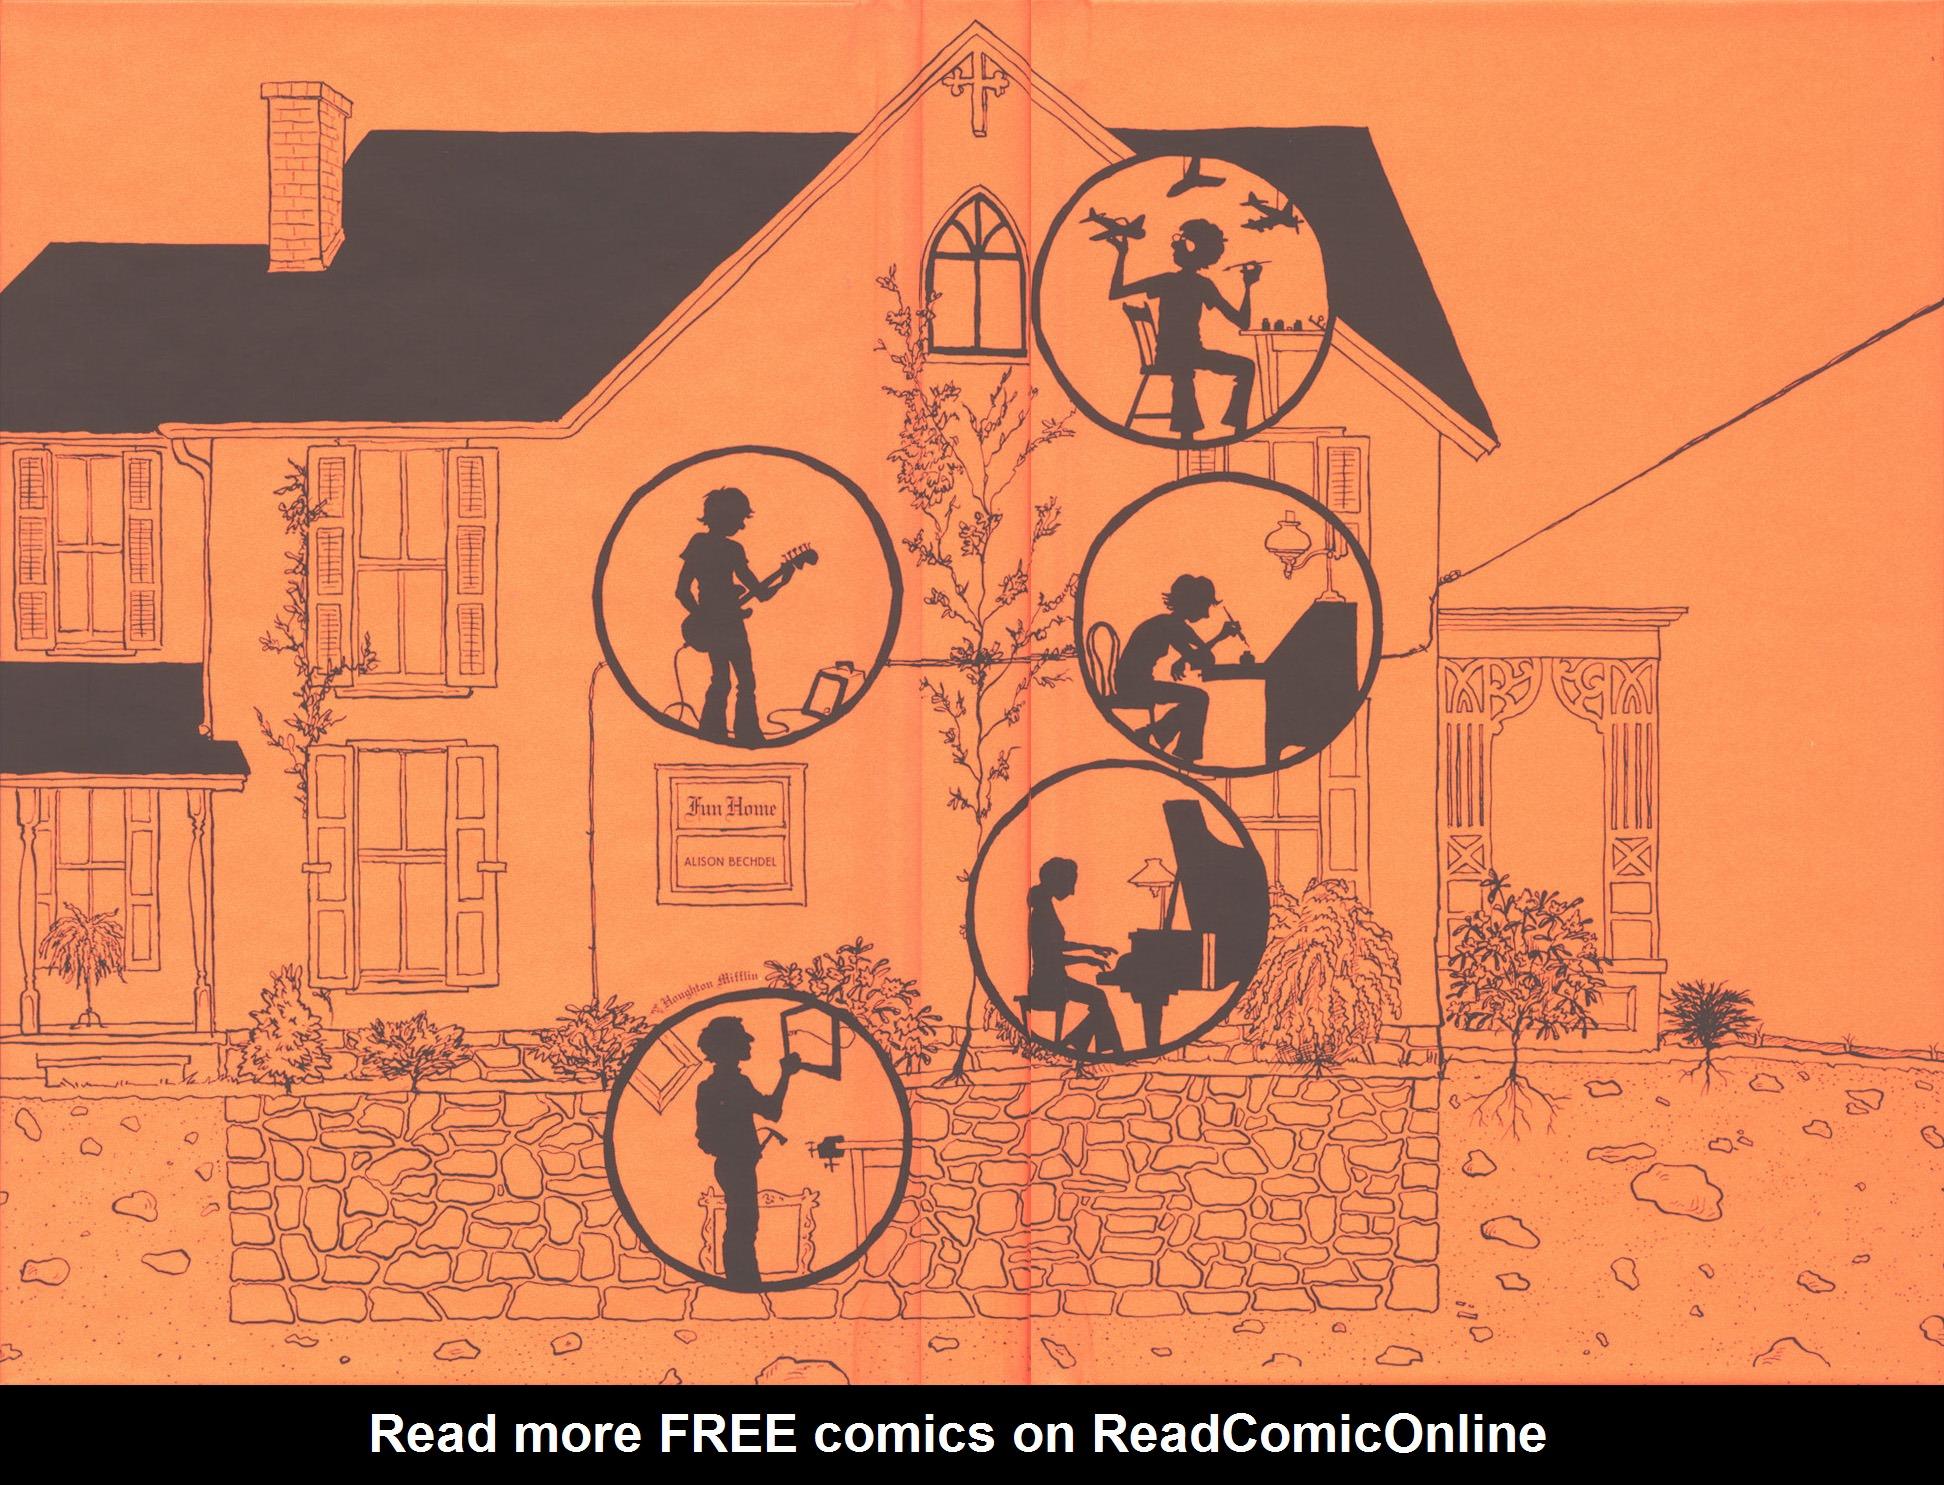 Read online Fun Home: A Family Tragicomic comic -  Issue # TPB - 2